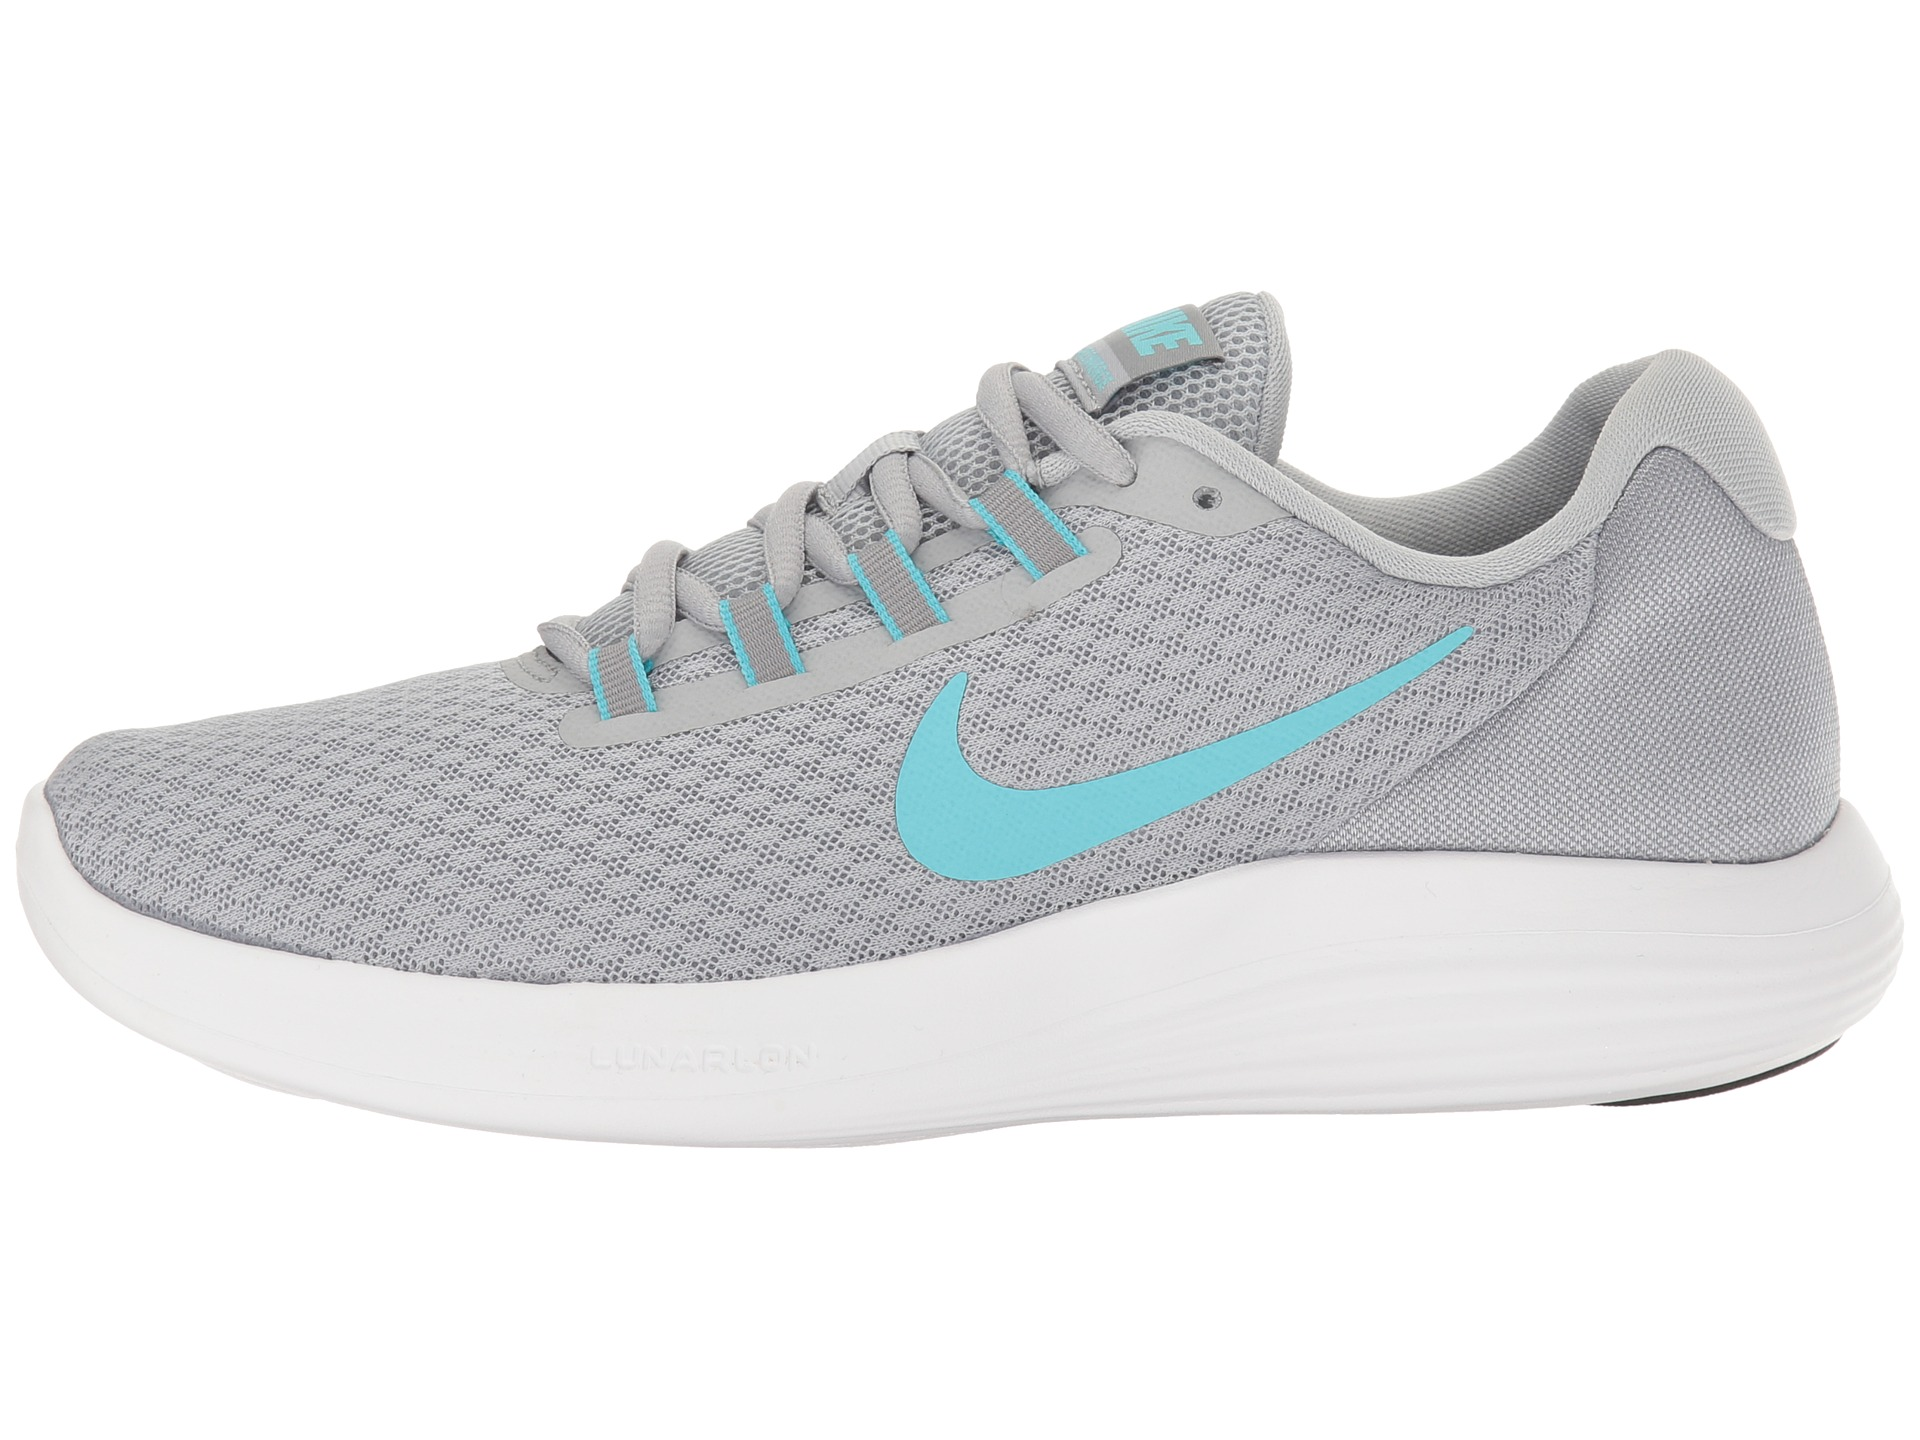 reputable site a72d1 44cee Nike Shox R2 Mens Nike Shox Nz | Обекти